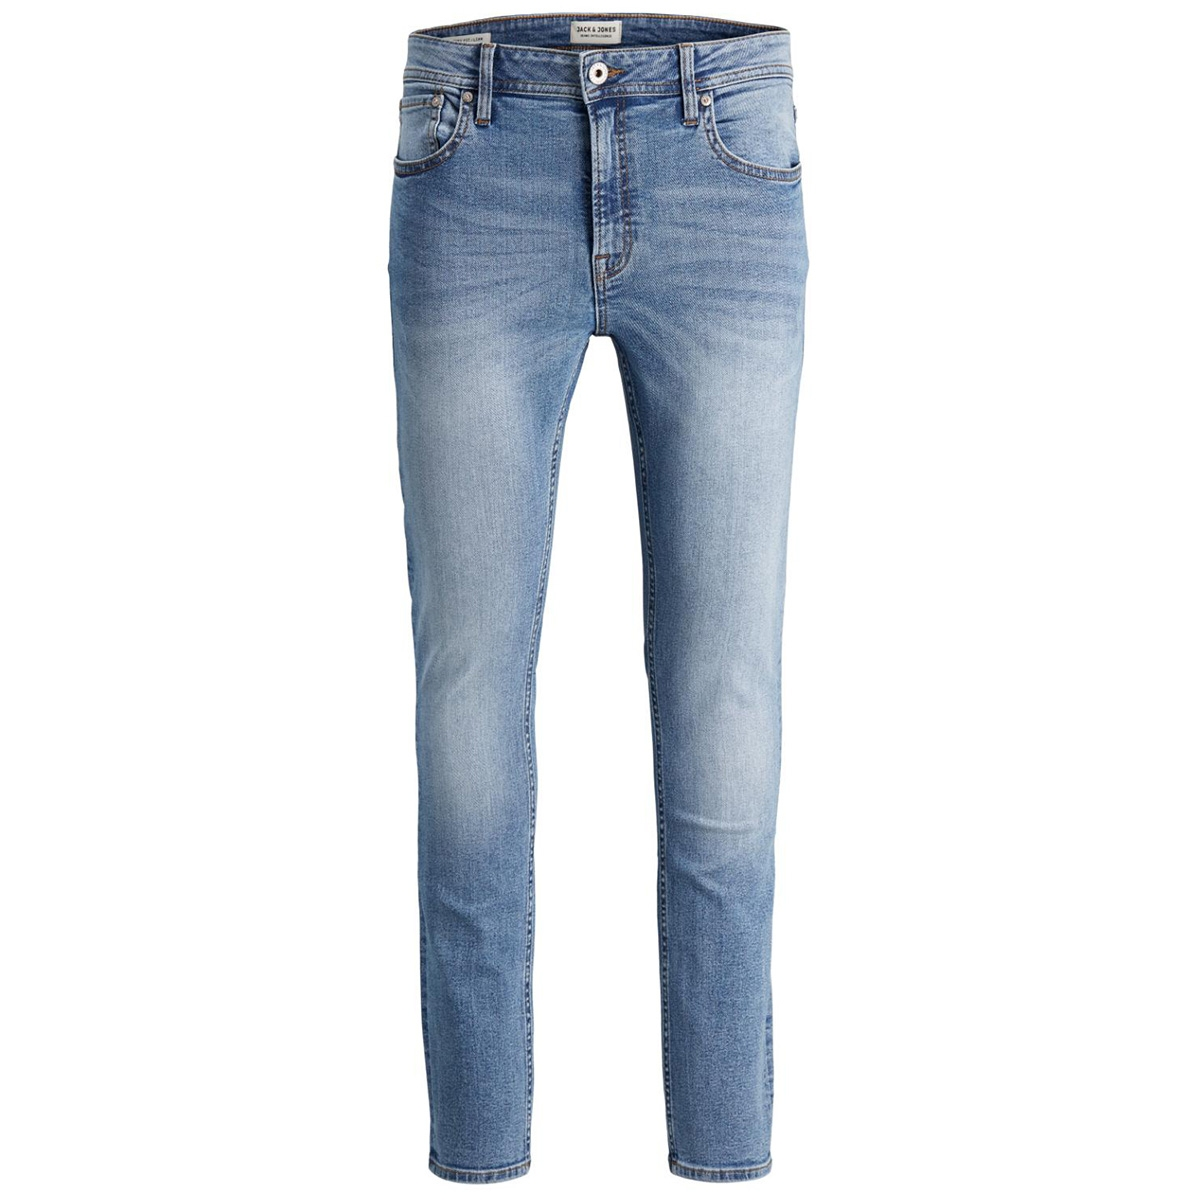 jjiglenn jjoriginal nz 003 noos 12141625 jack & jones jeans blue denim